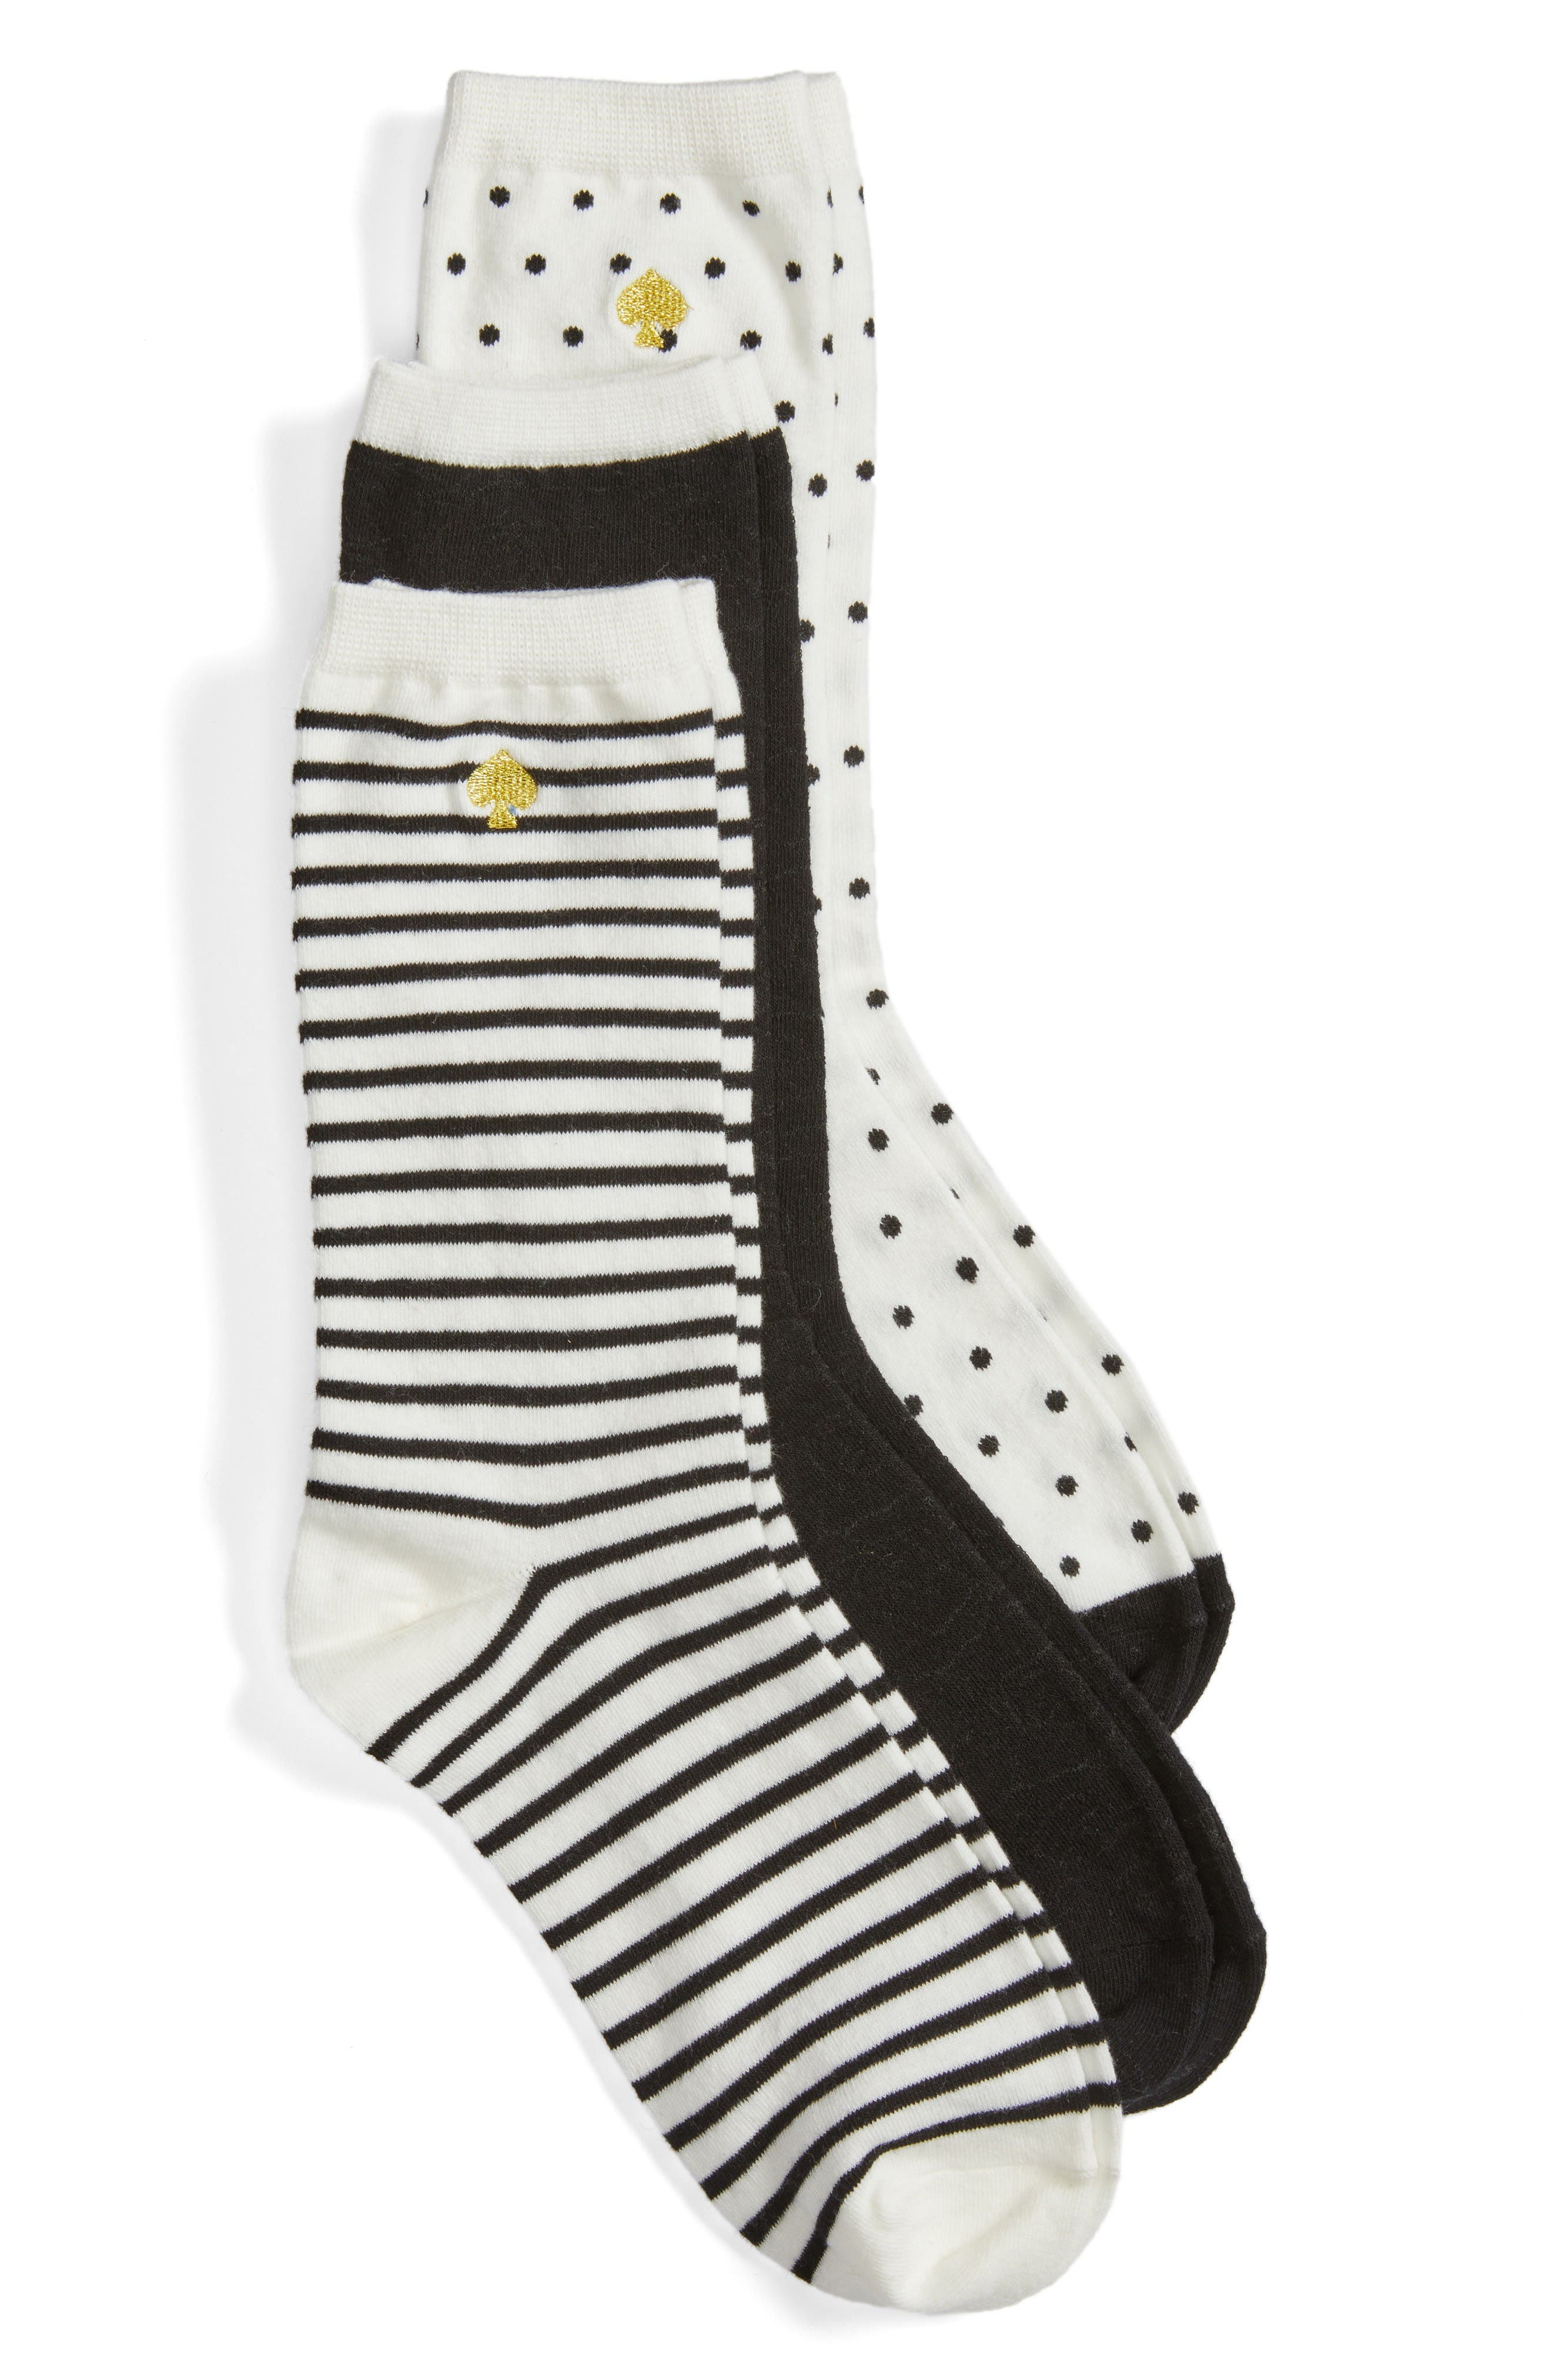 Main Image - kate spade new york assorted 3-pack crew socks